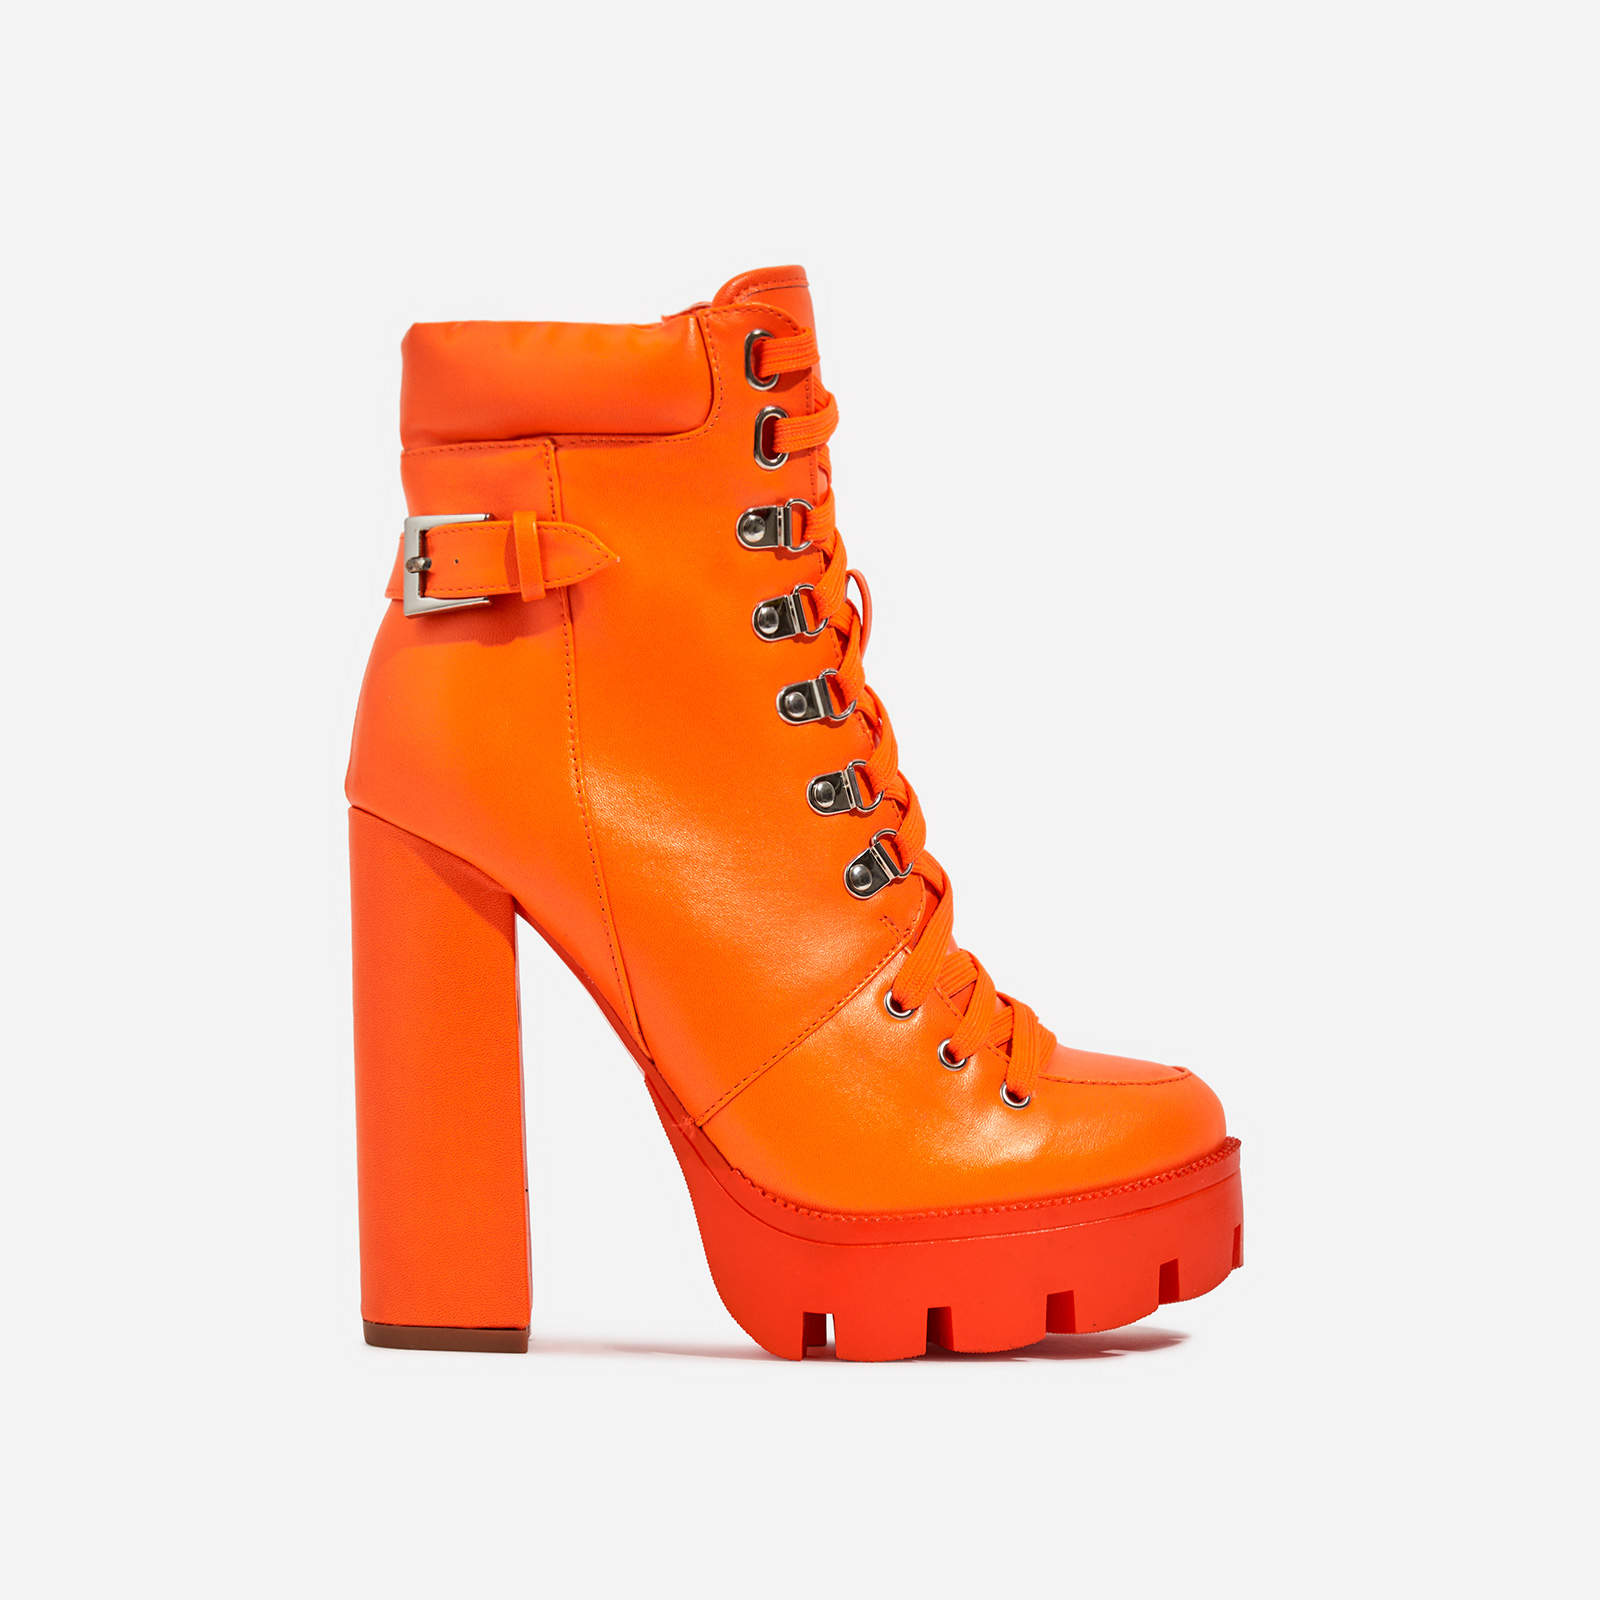 Veera Platform Lace Up Ankle Biker Boot In Neon Orange Faux Leather